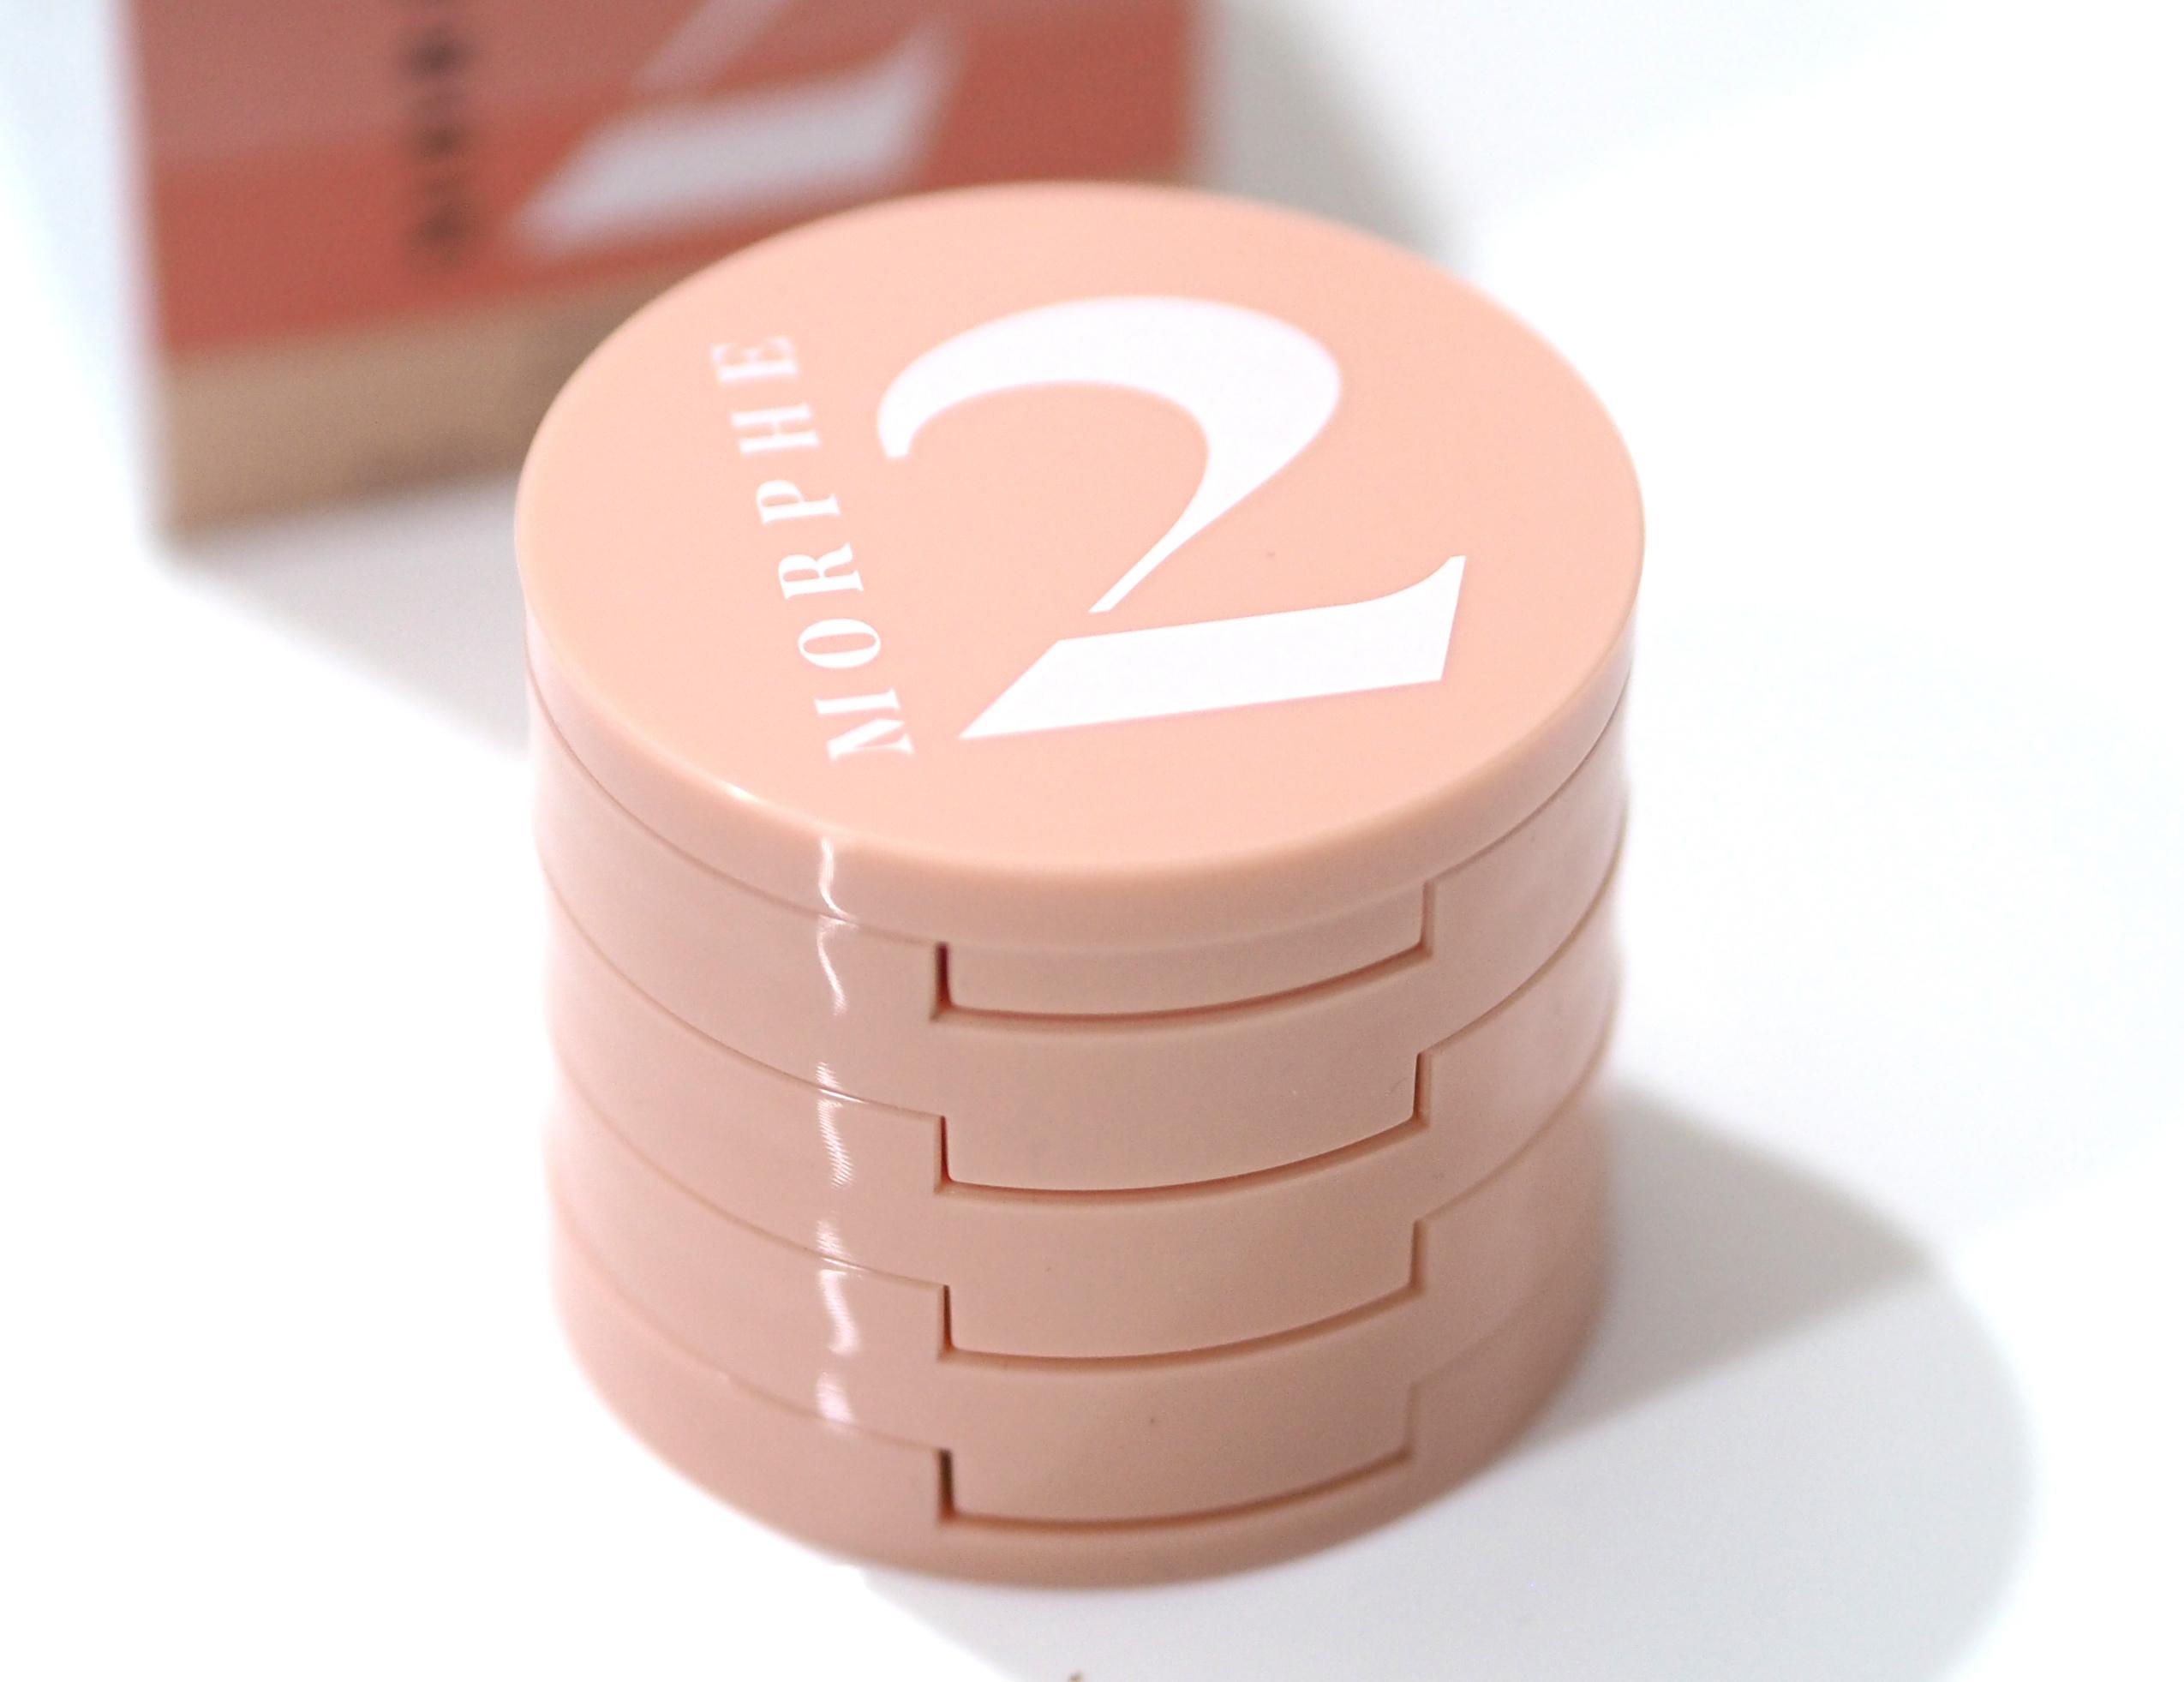 Morphe 2 Fresh Peach Quad Goals Multi-Palette Review Swatches